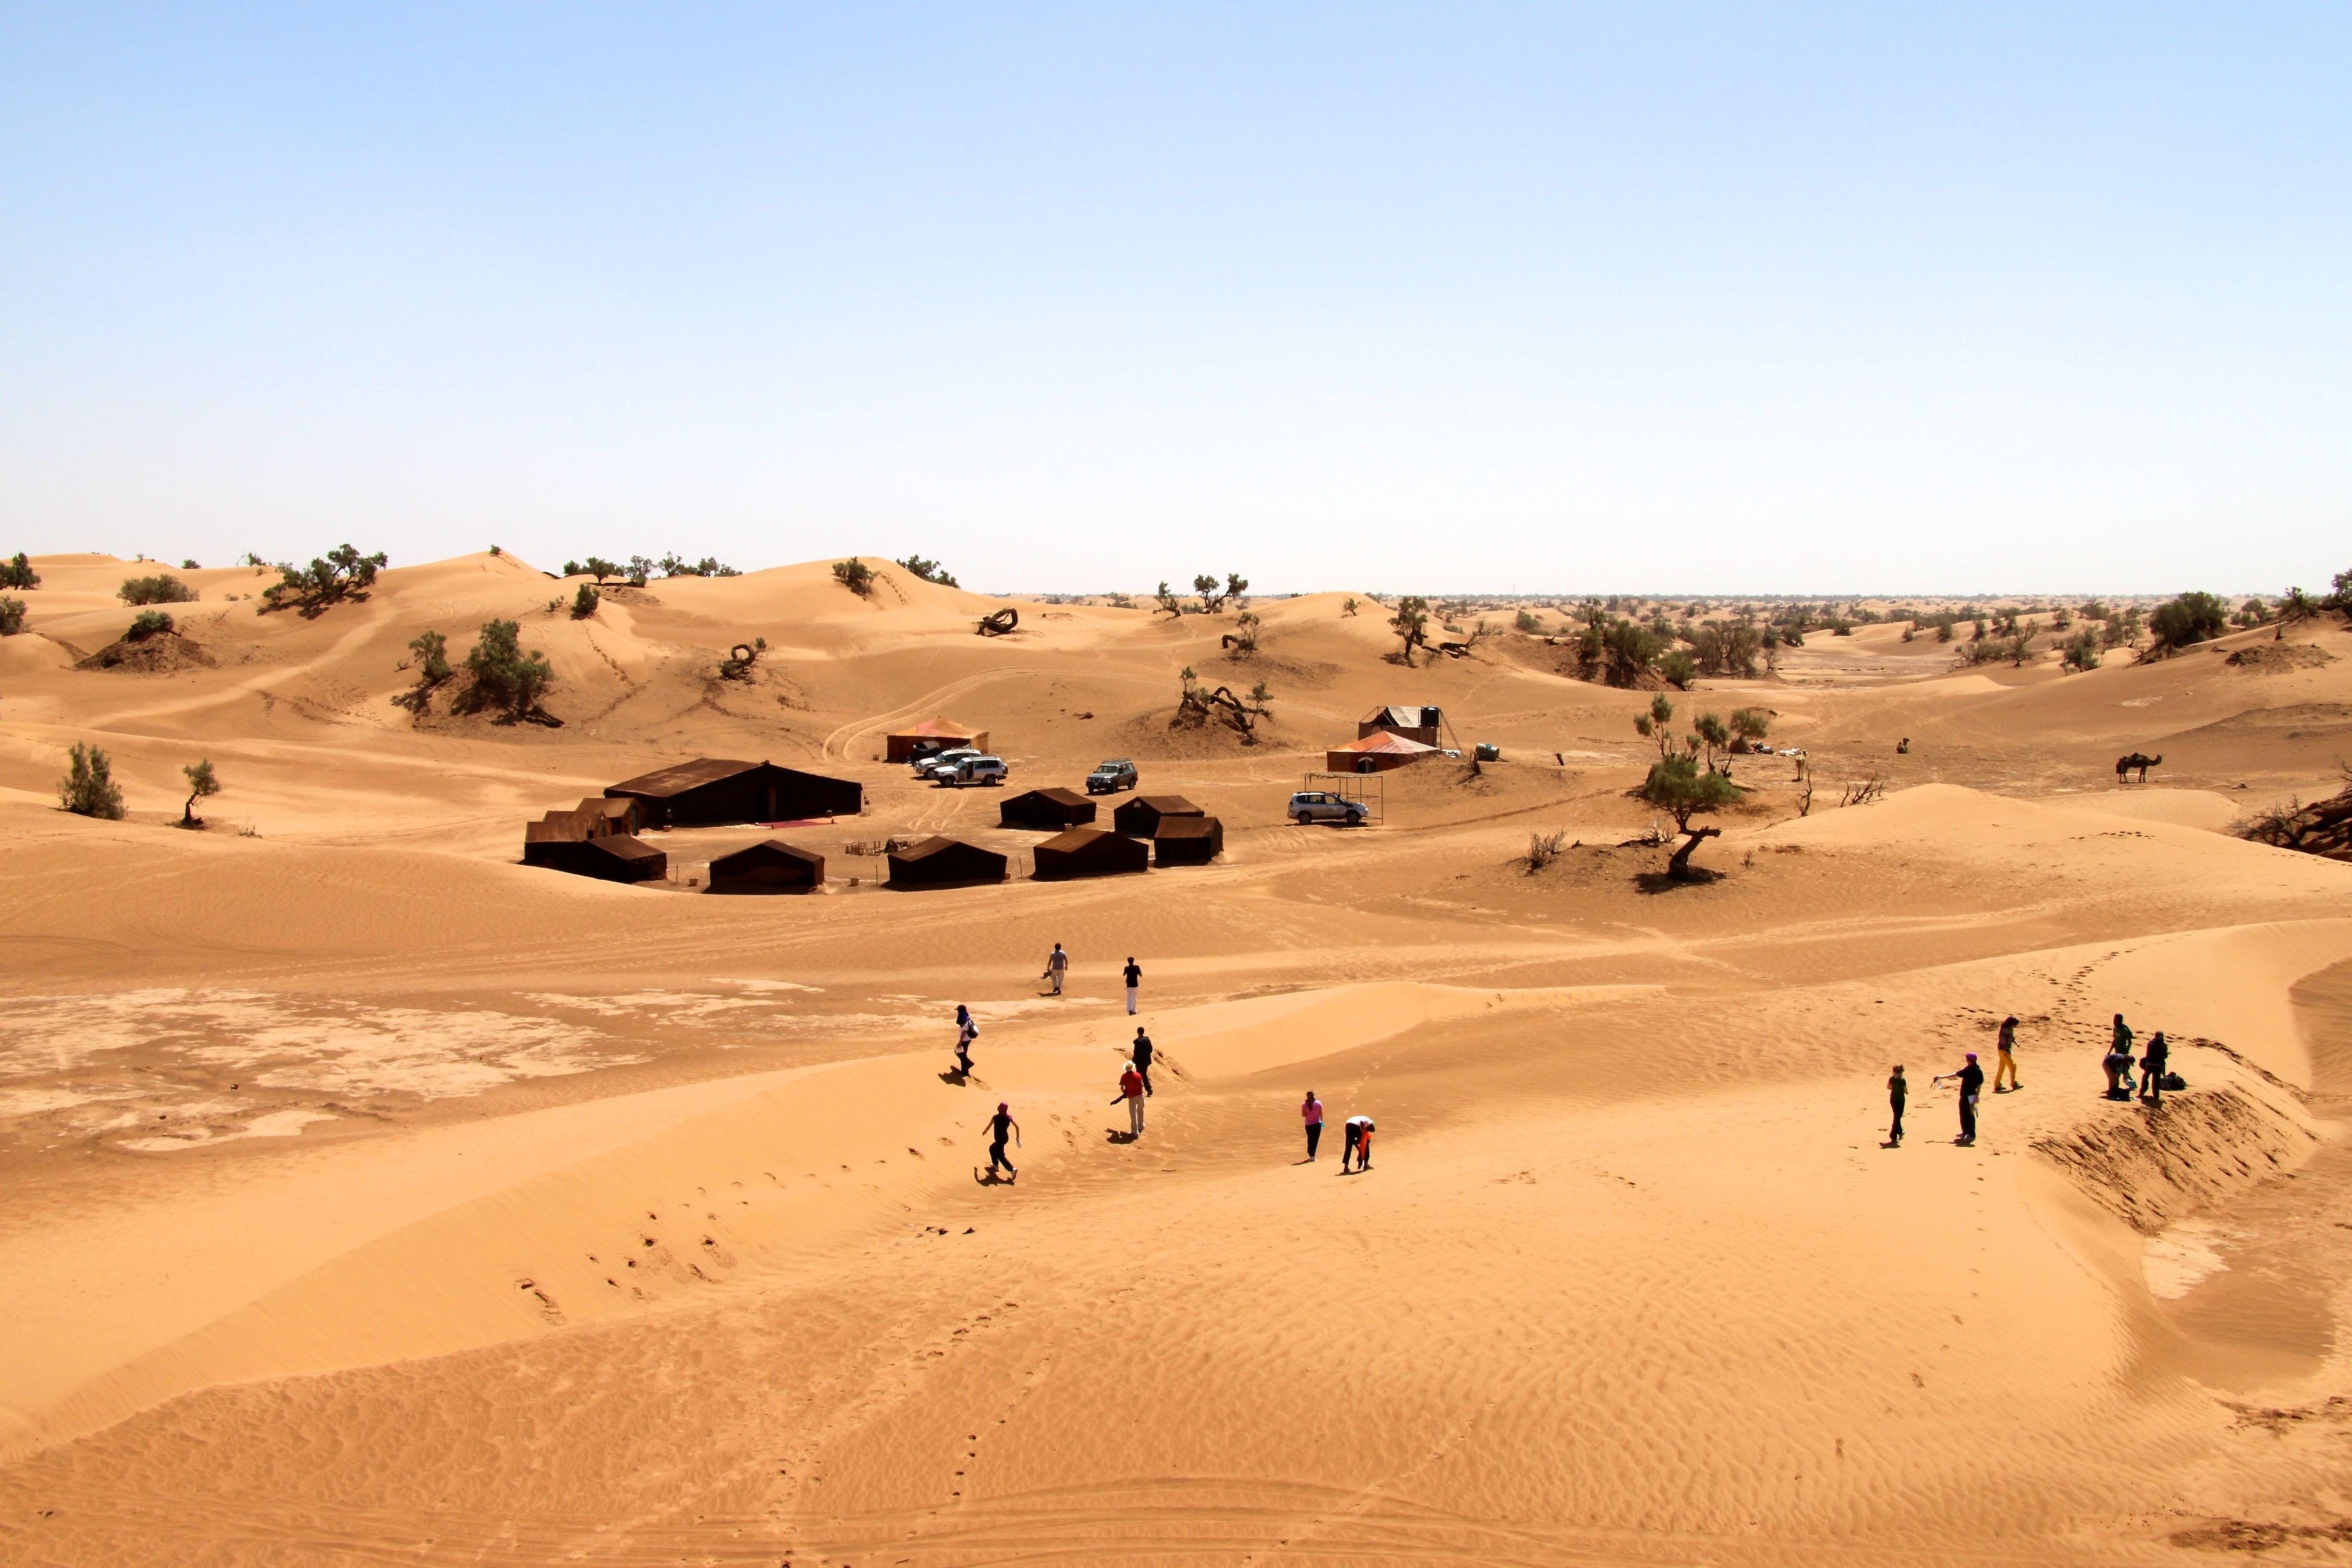 Hd Wallpaper Person Walking On Desert Man Standing In The Middle Of Desert Wallpaper Flare